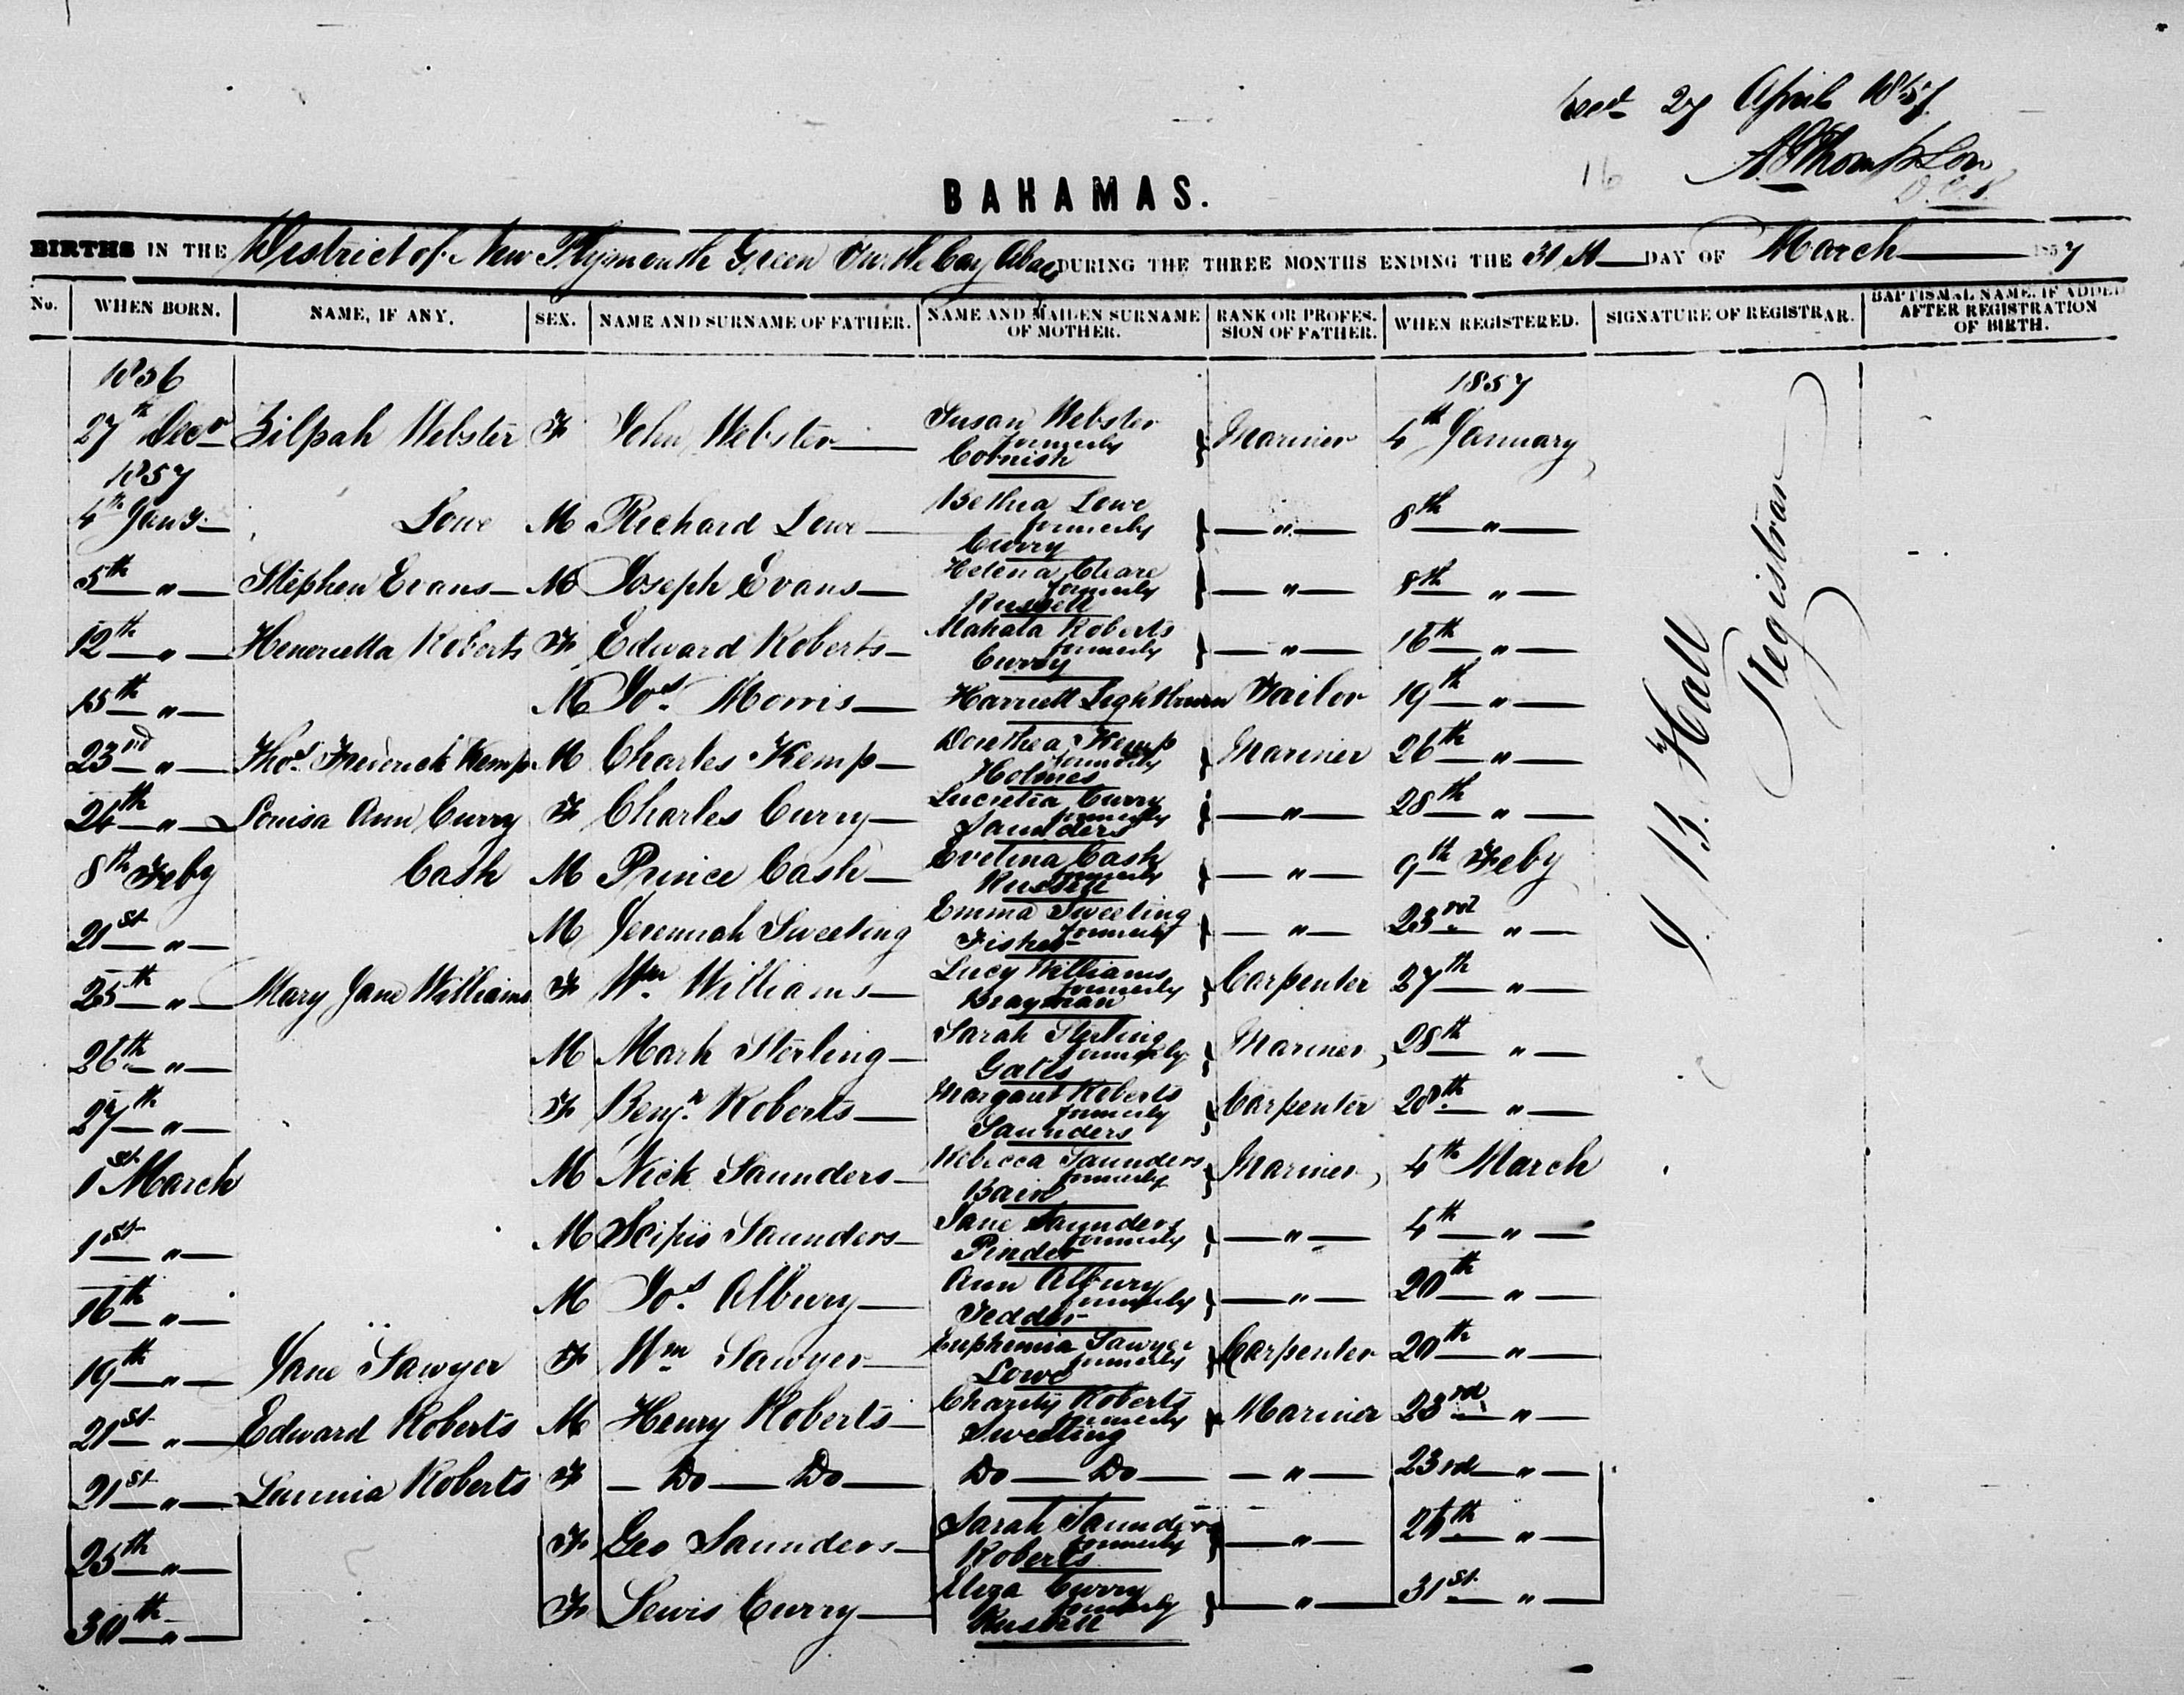 Birth Record for Sarah Starling, Daughter of Mark and Sarah Starling - 1867